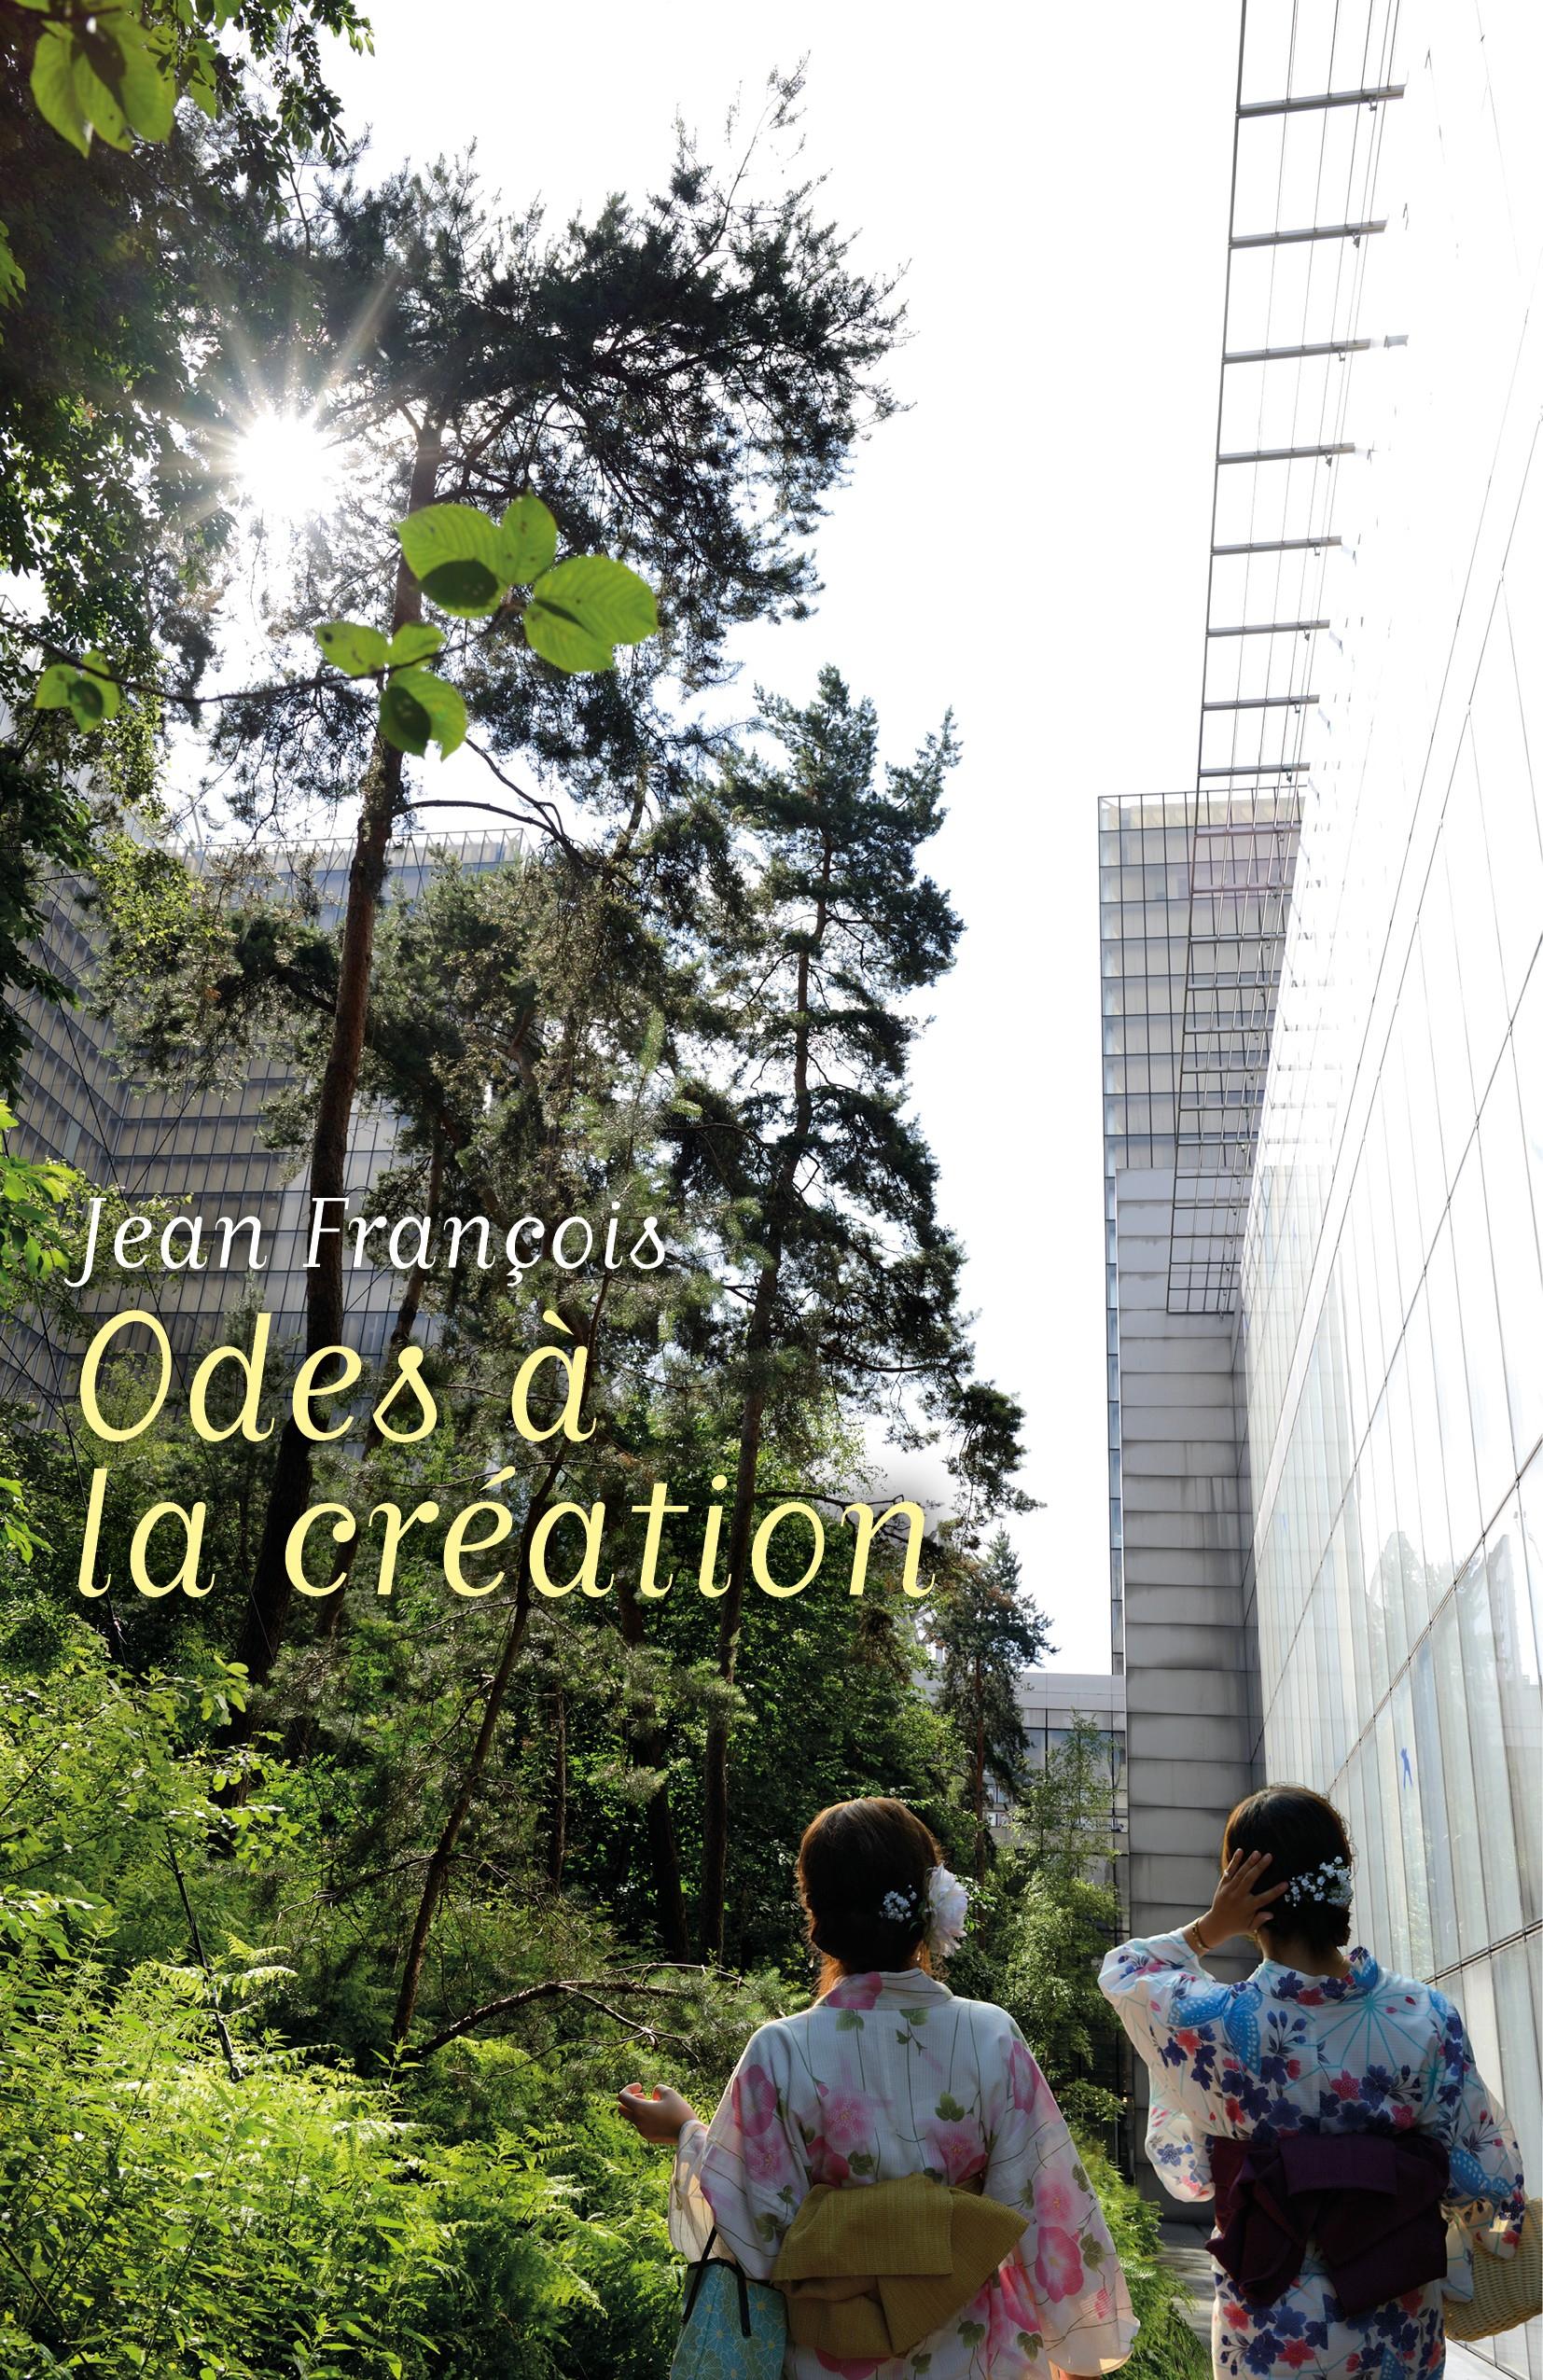 ODES A LA CREATION